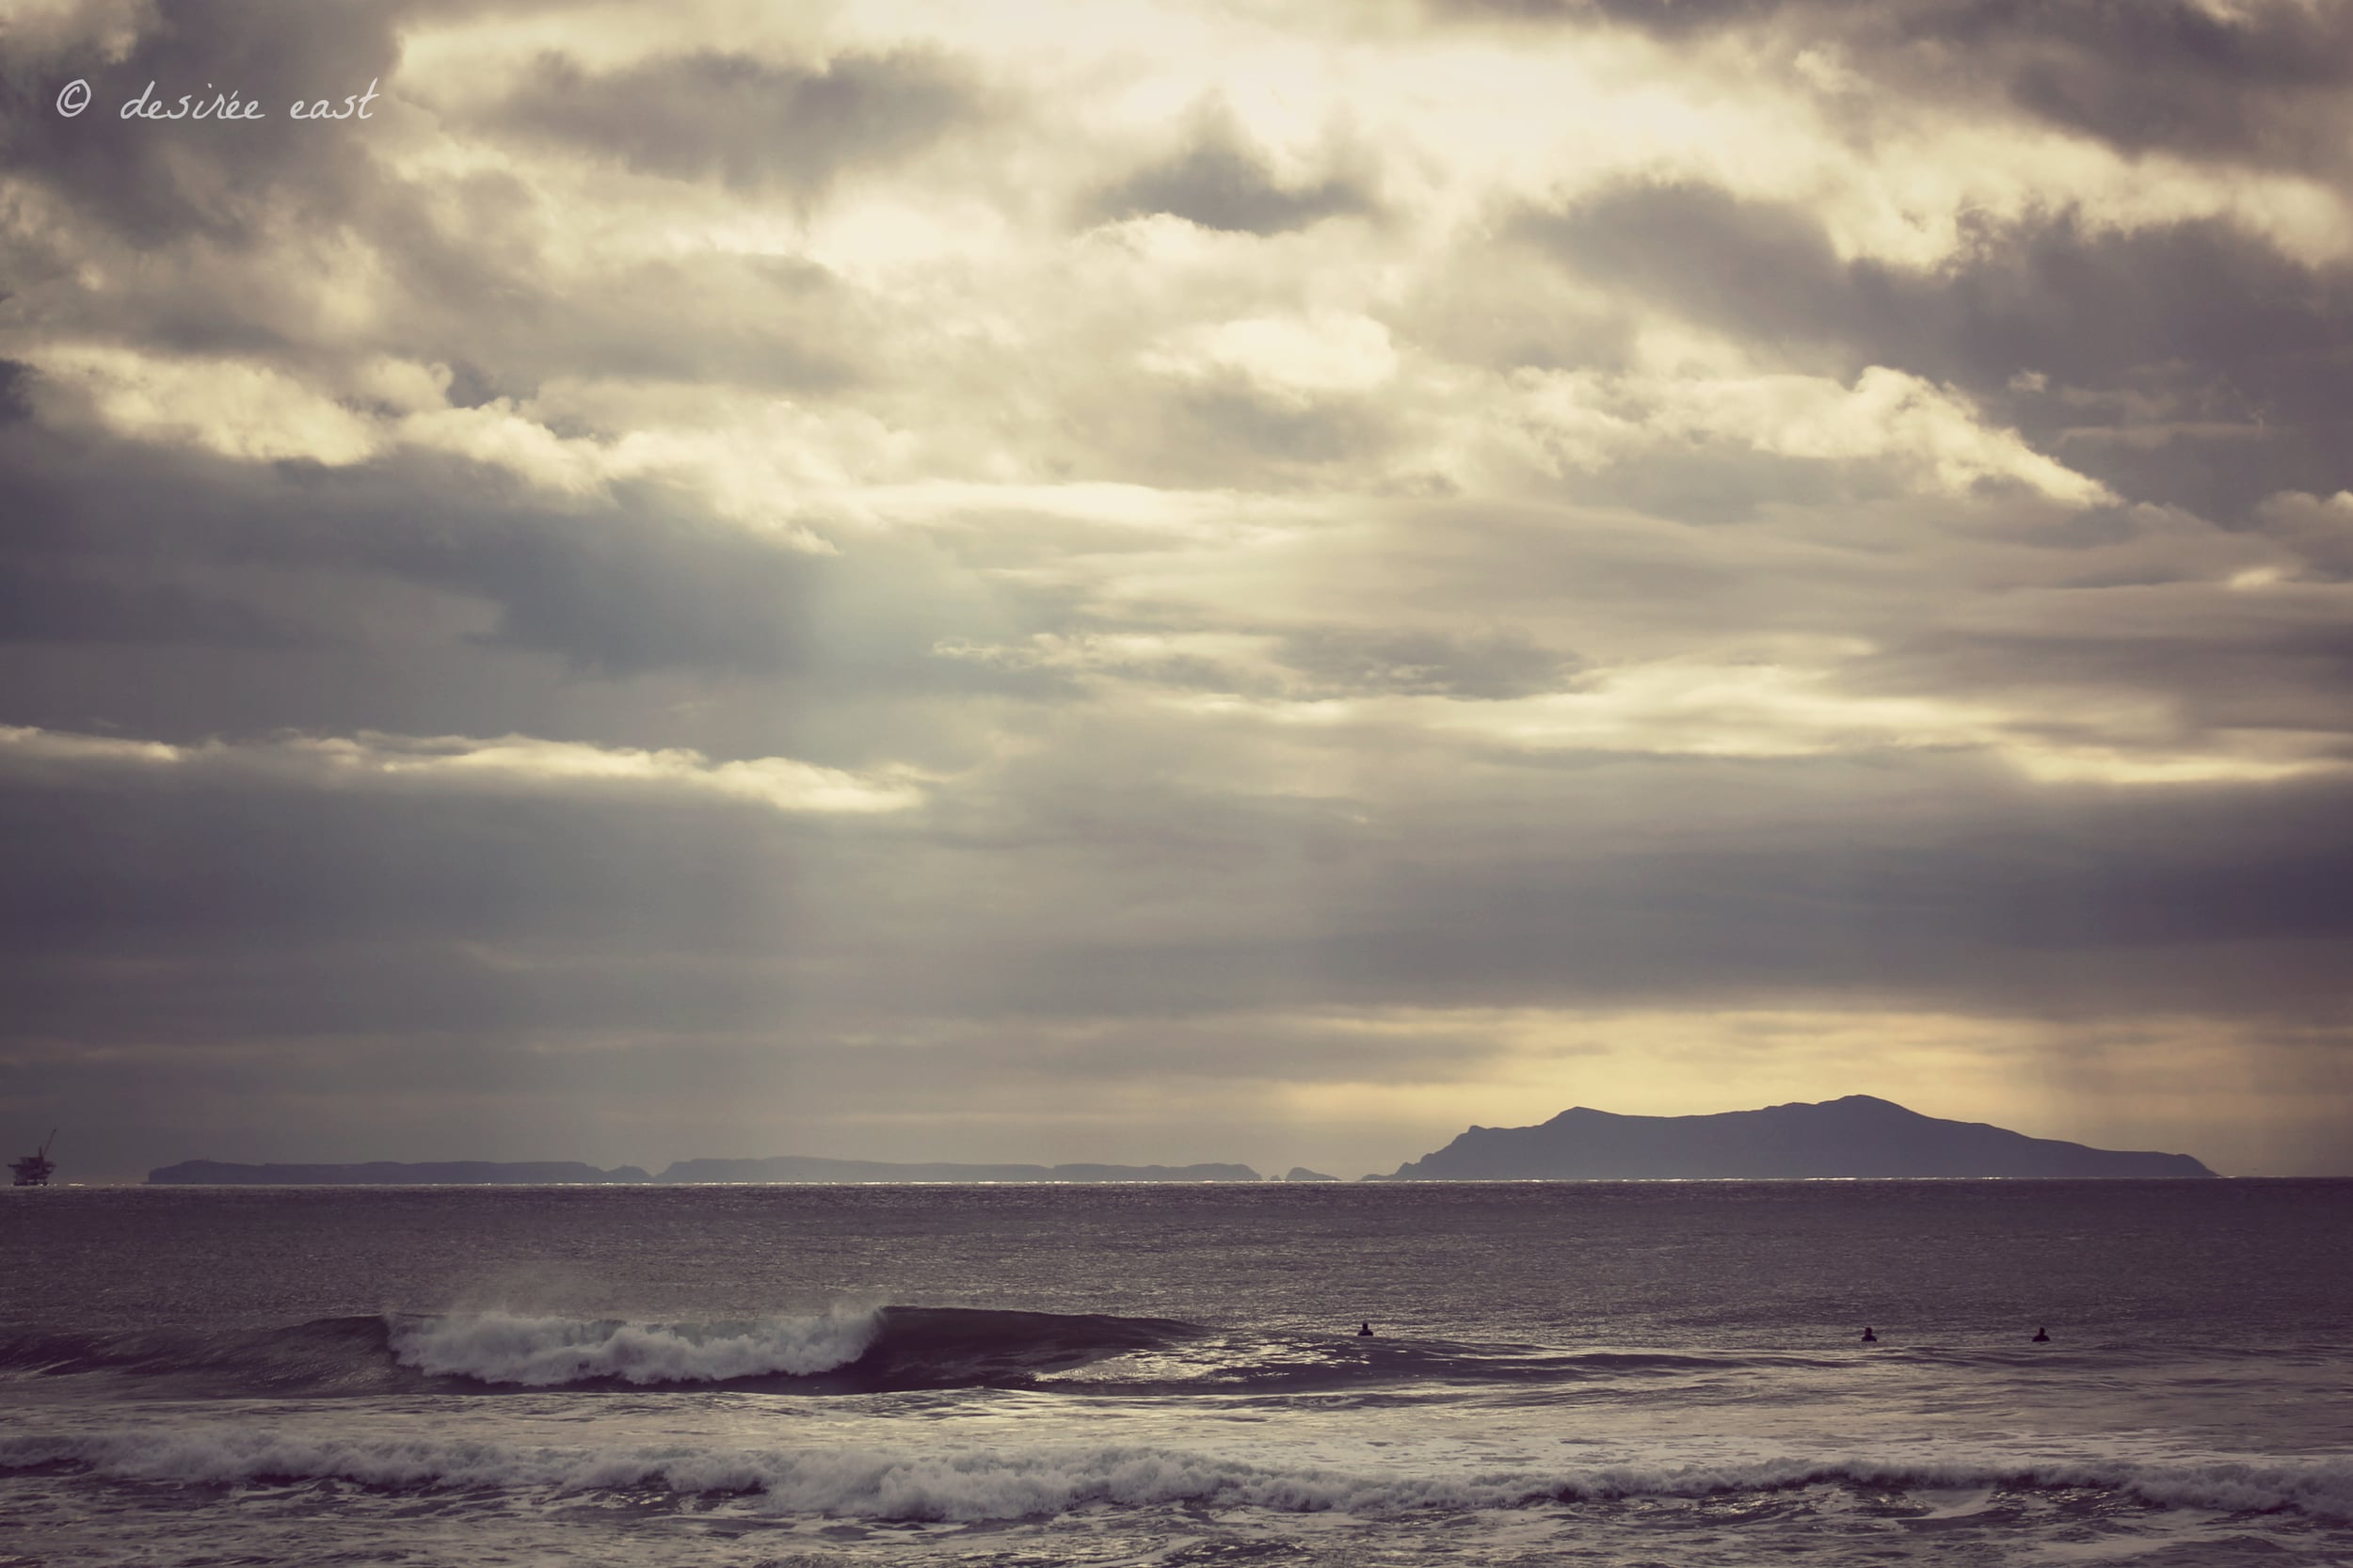 epic view of anacapa island. hollywood beach, california. photo by desiree east